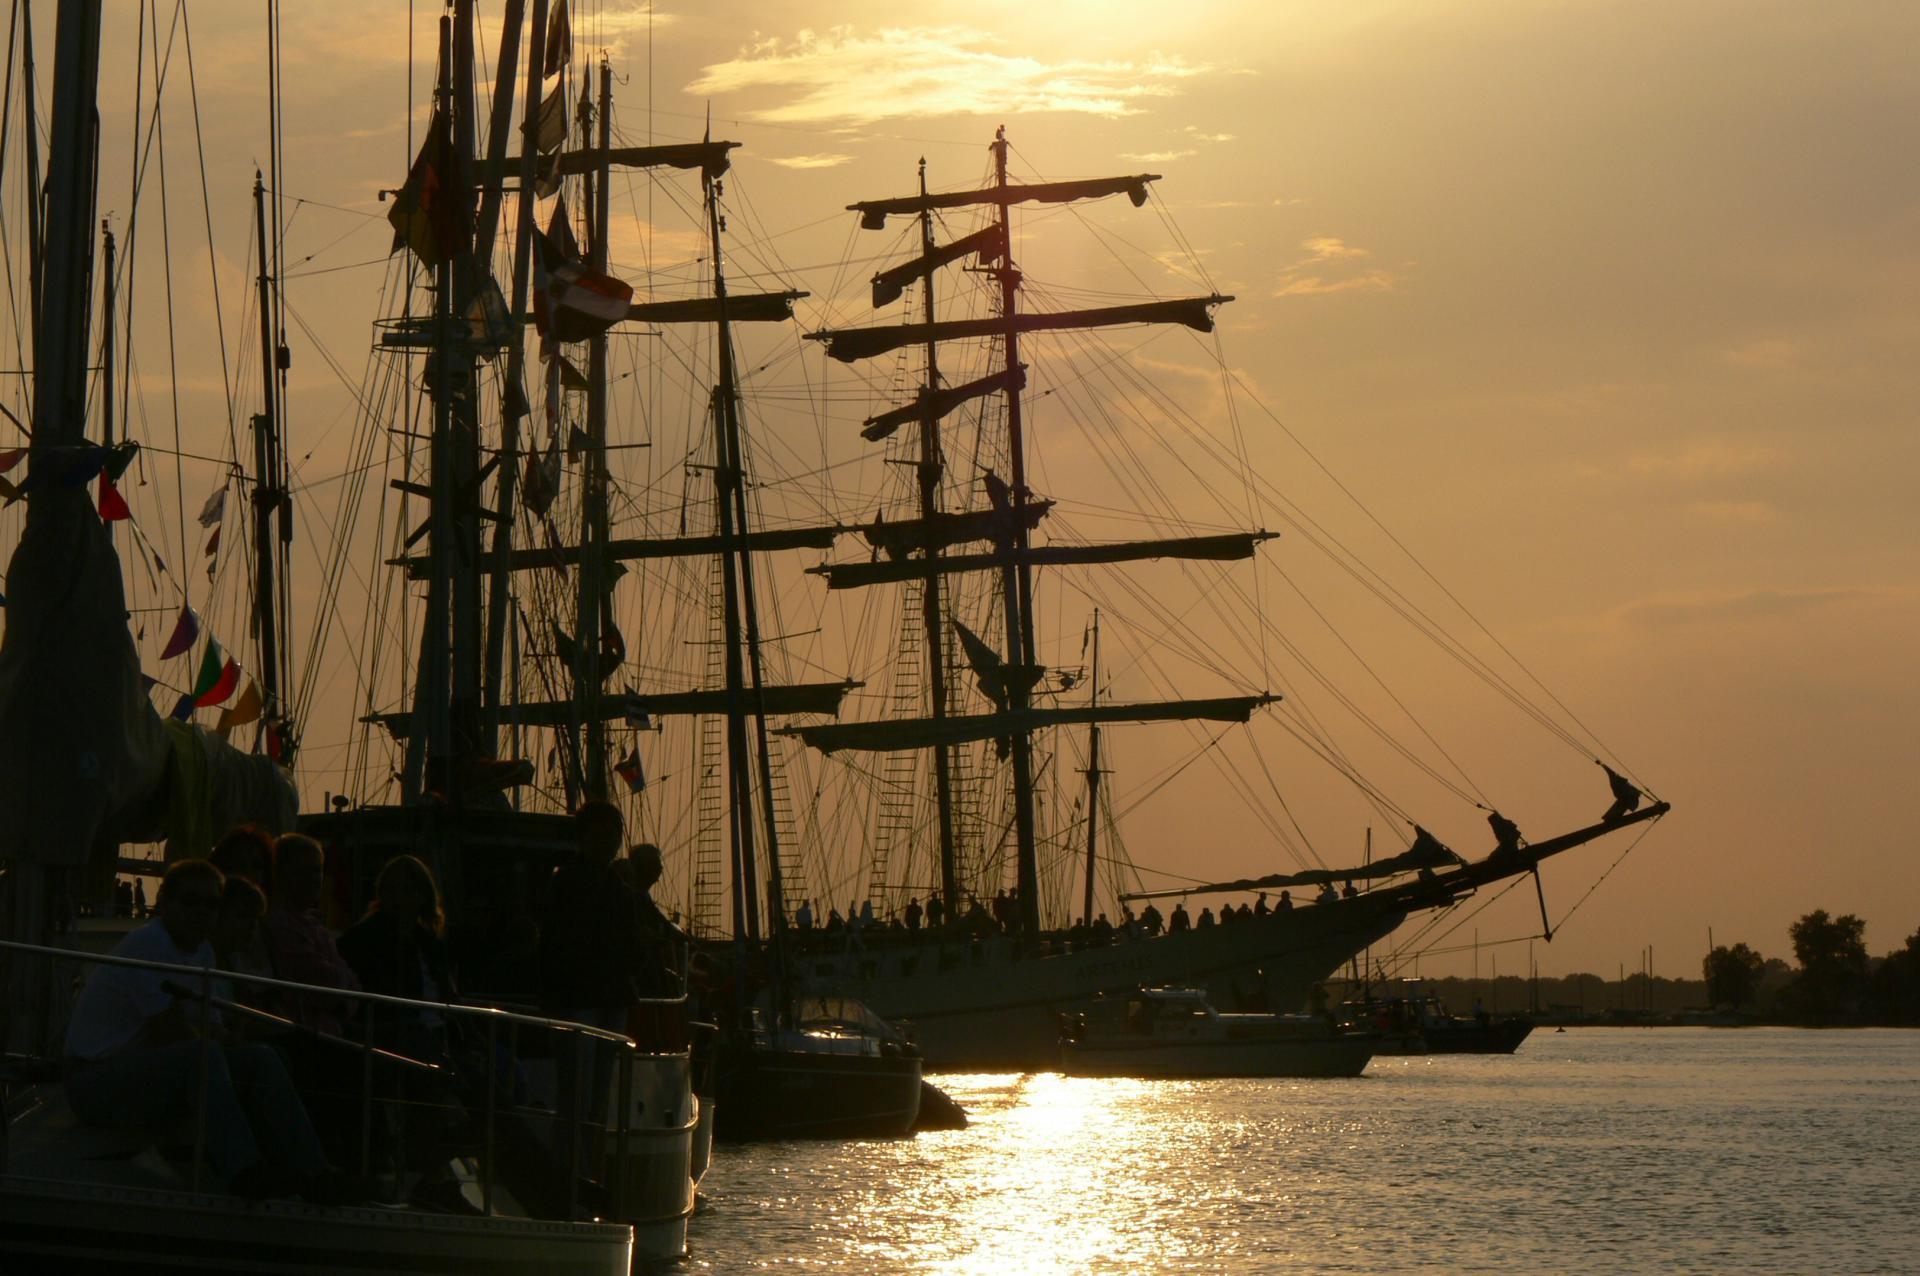 Abend on Bord der Artemis